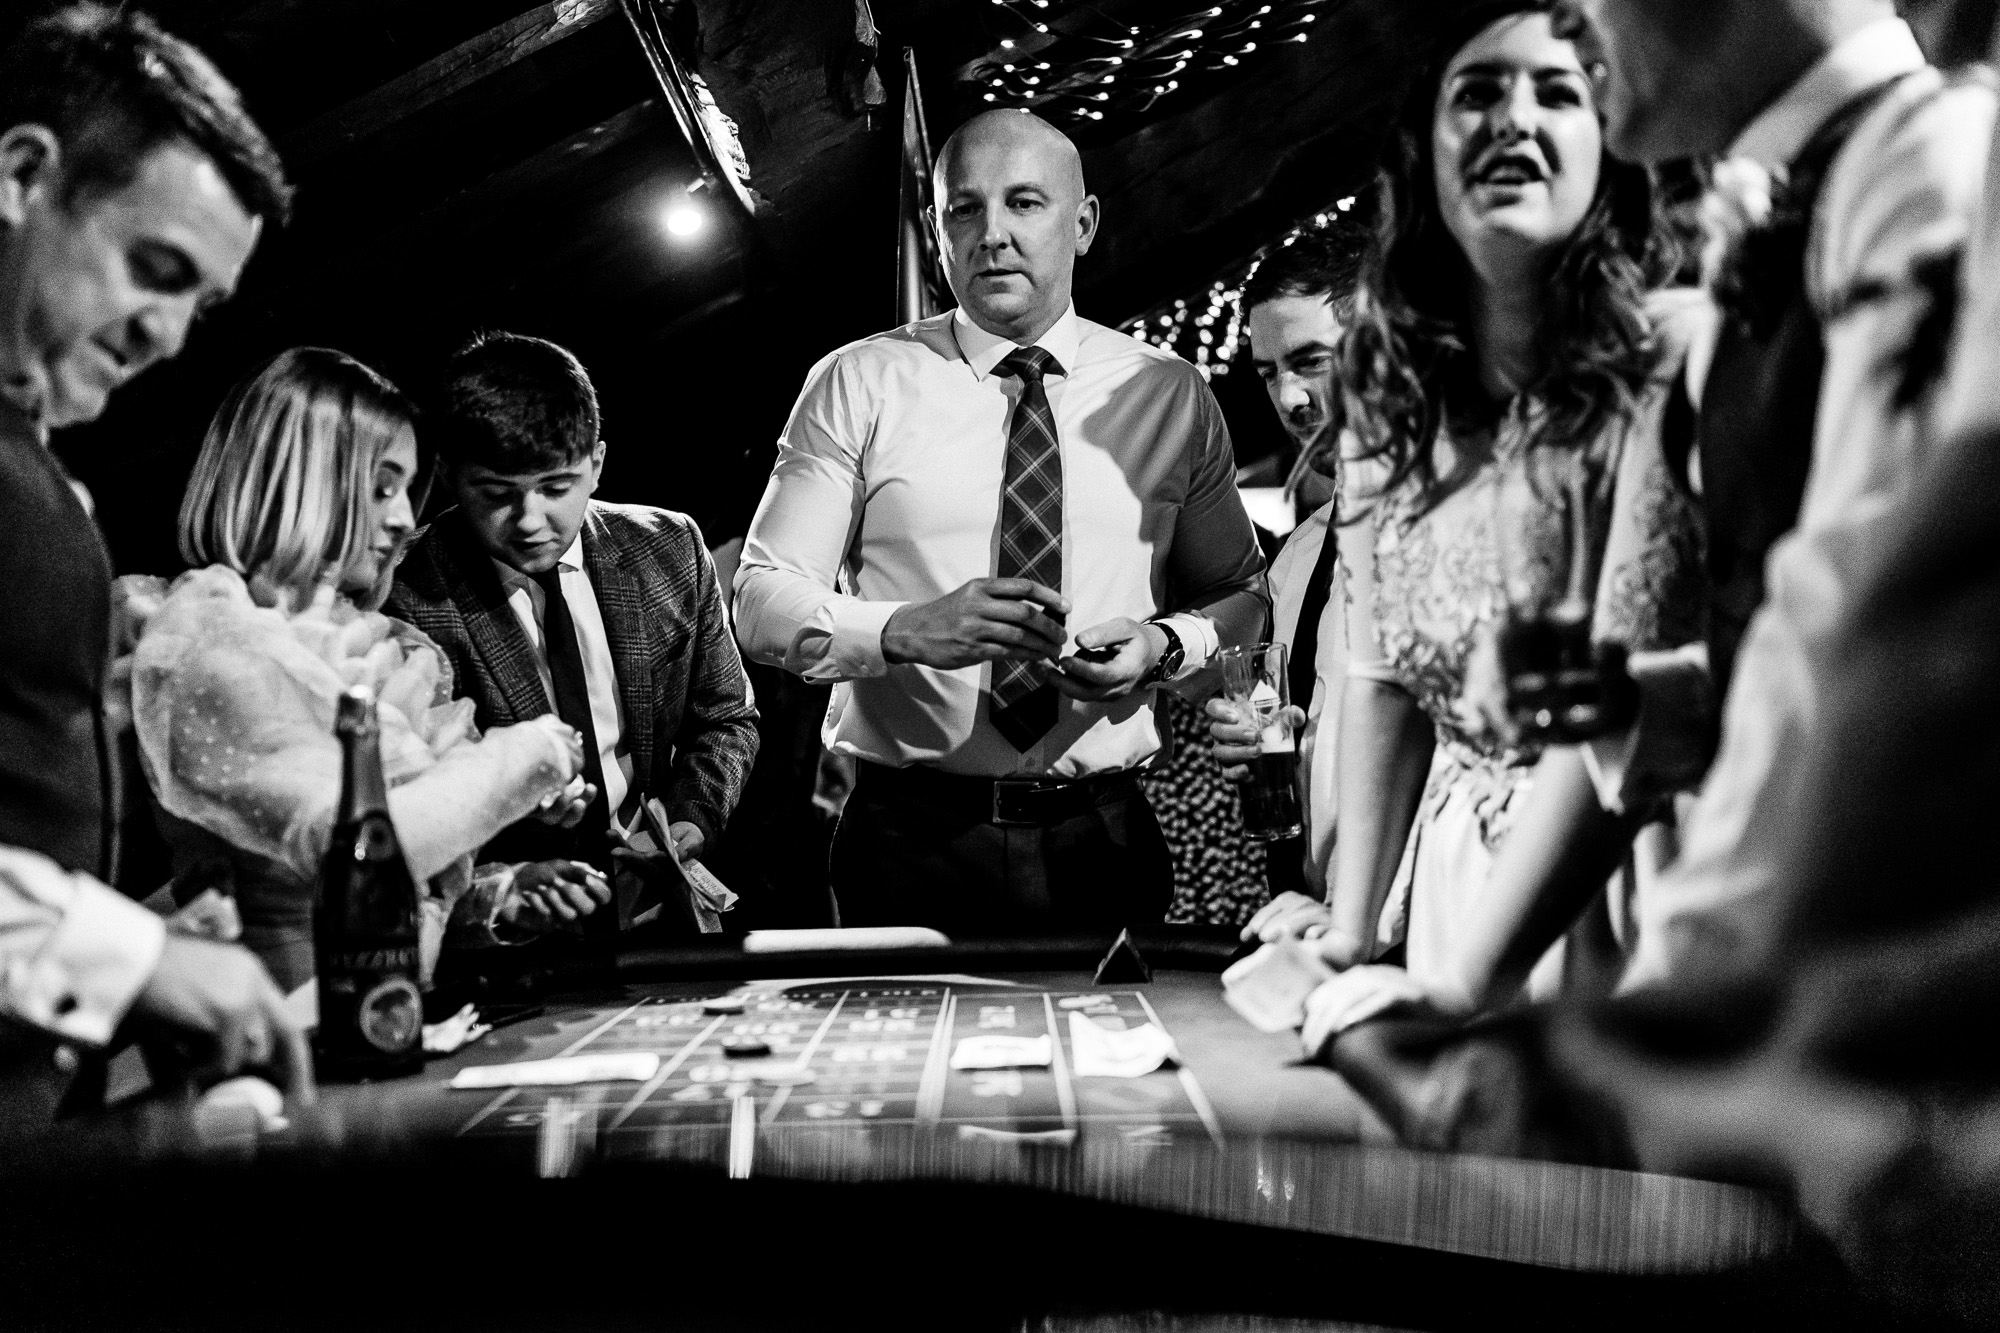 Rivington Hall Barn Wedding PHotographer lancashire wedding photography (32 of 34).jpg